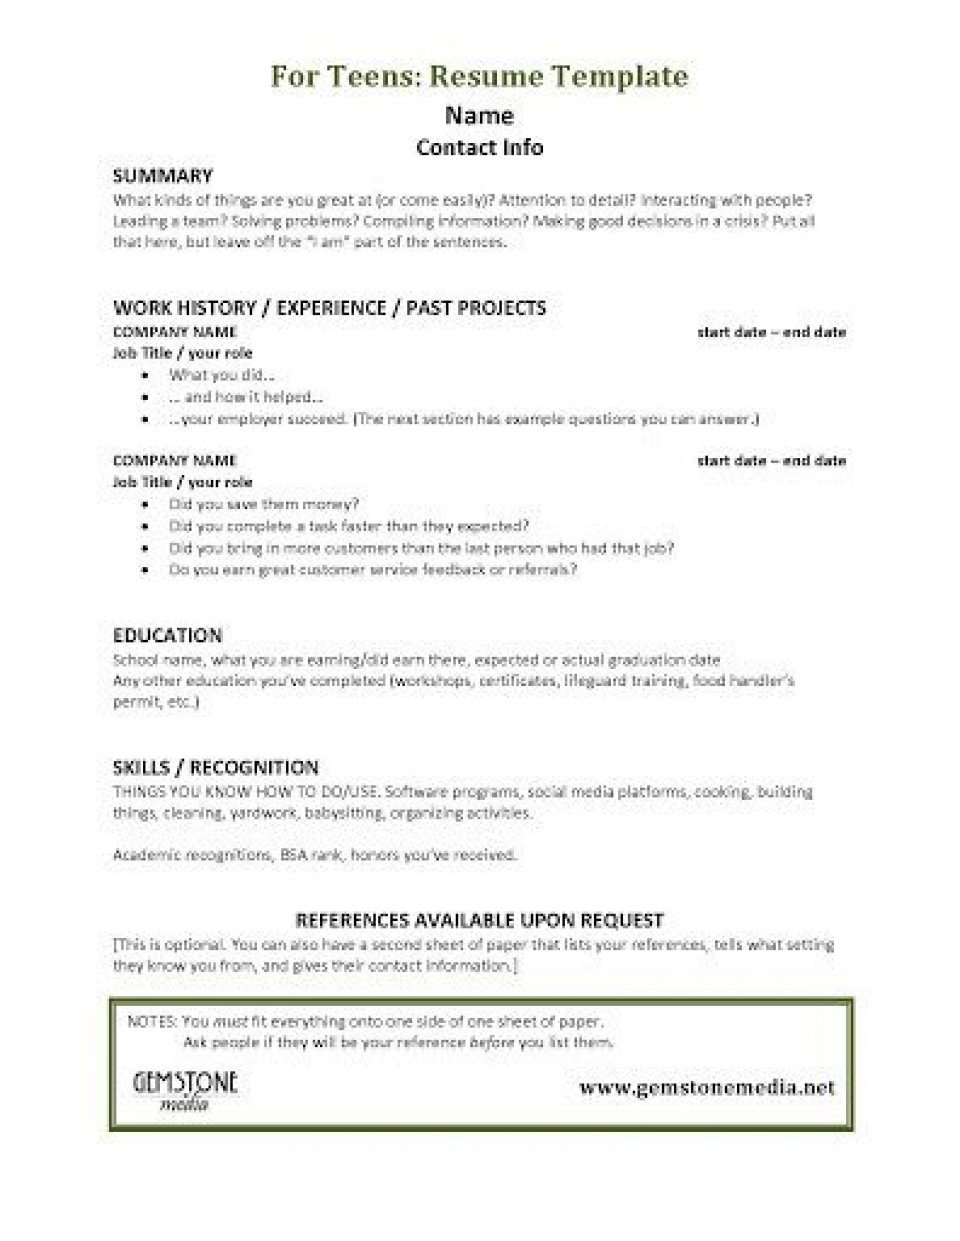 001 Astounding Resume Template For Teen Design  Teenager First Job Australia960